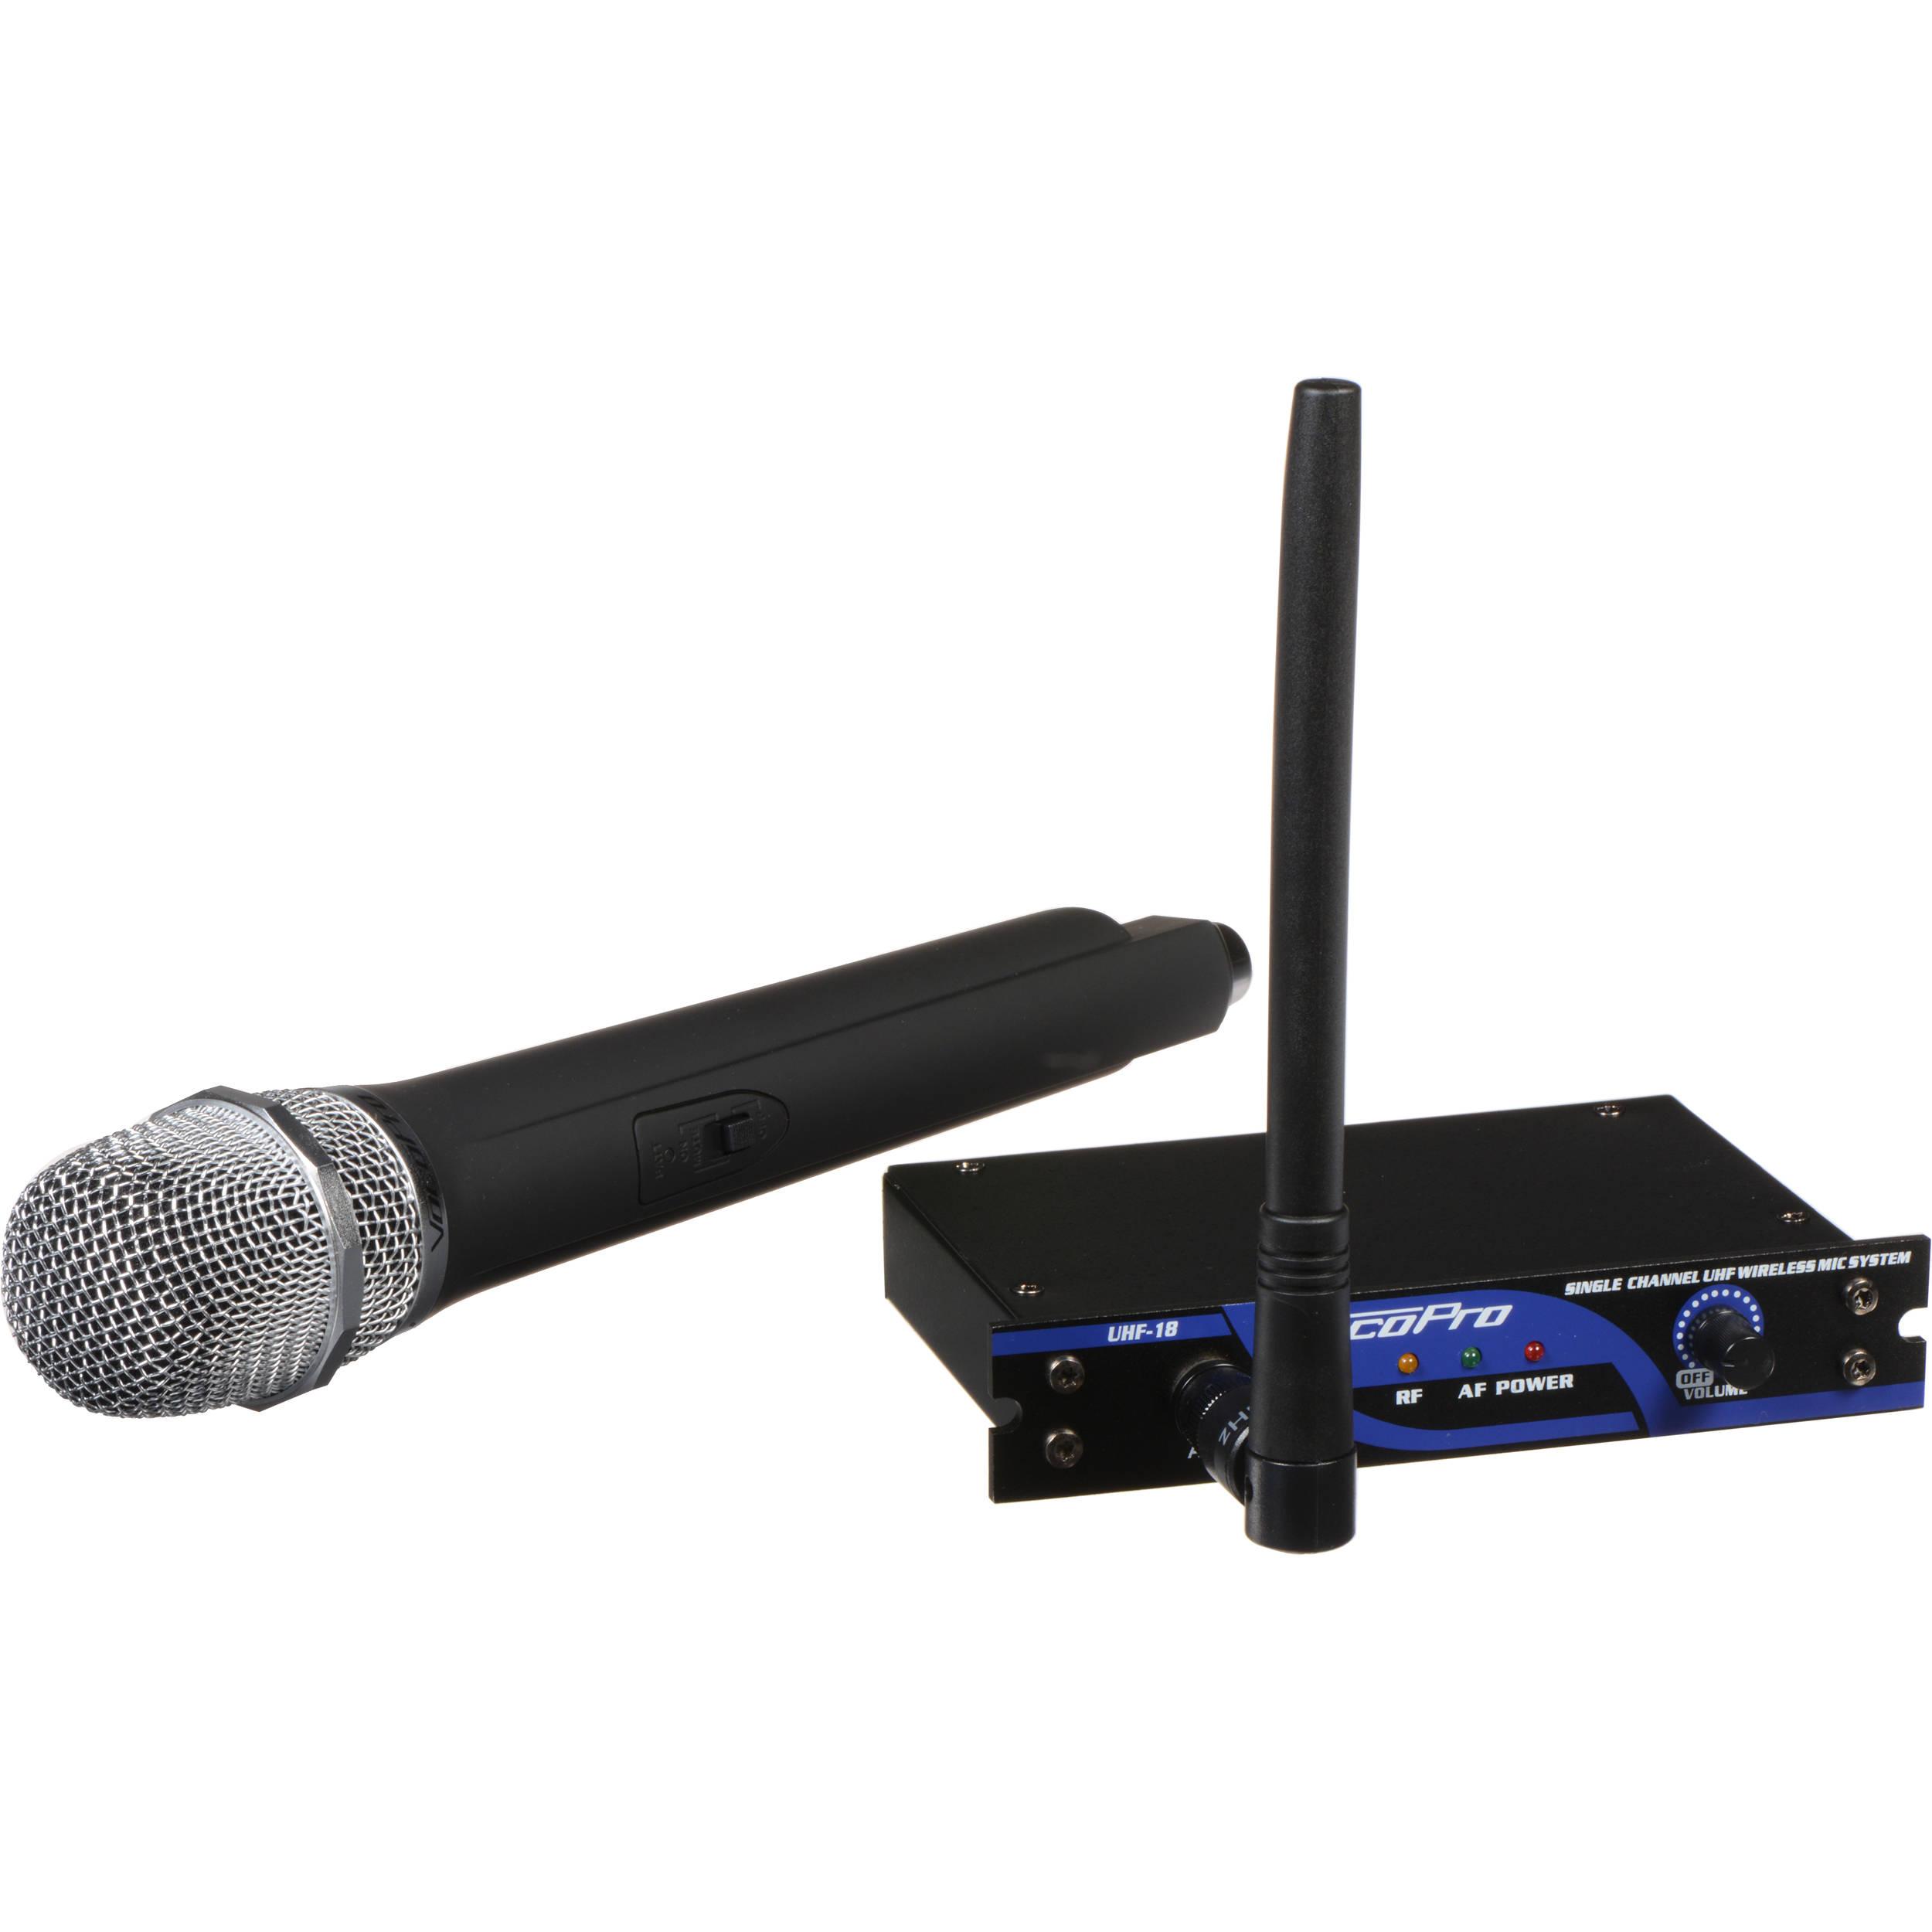 VocoPro UHF-18-9 Single-Channel Wireless Microphone System (915 00 MHz)